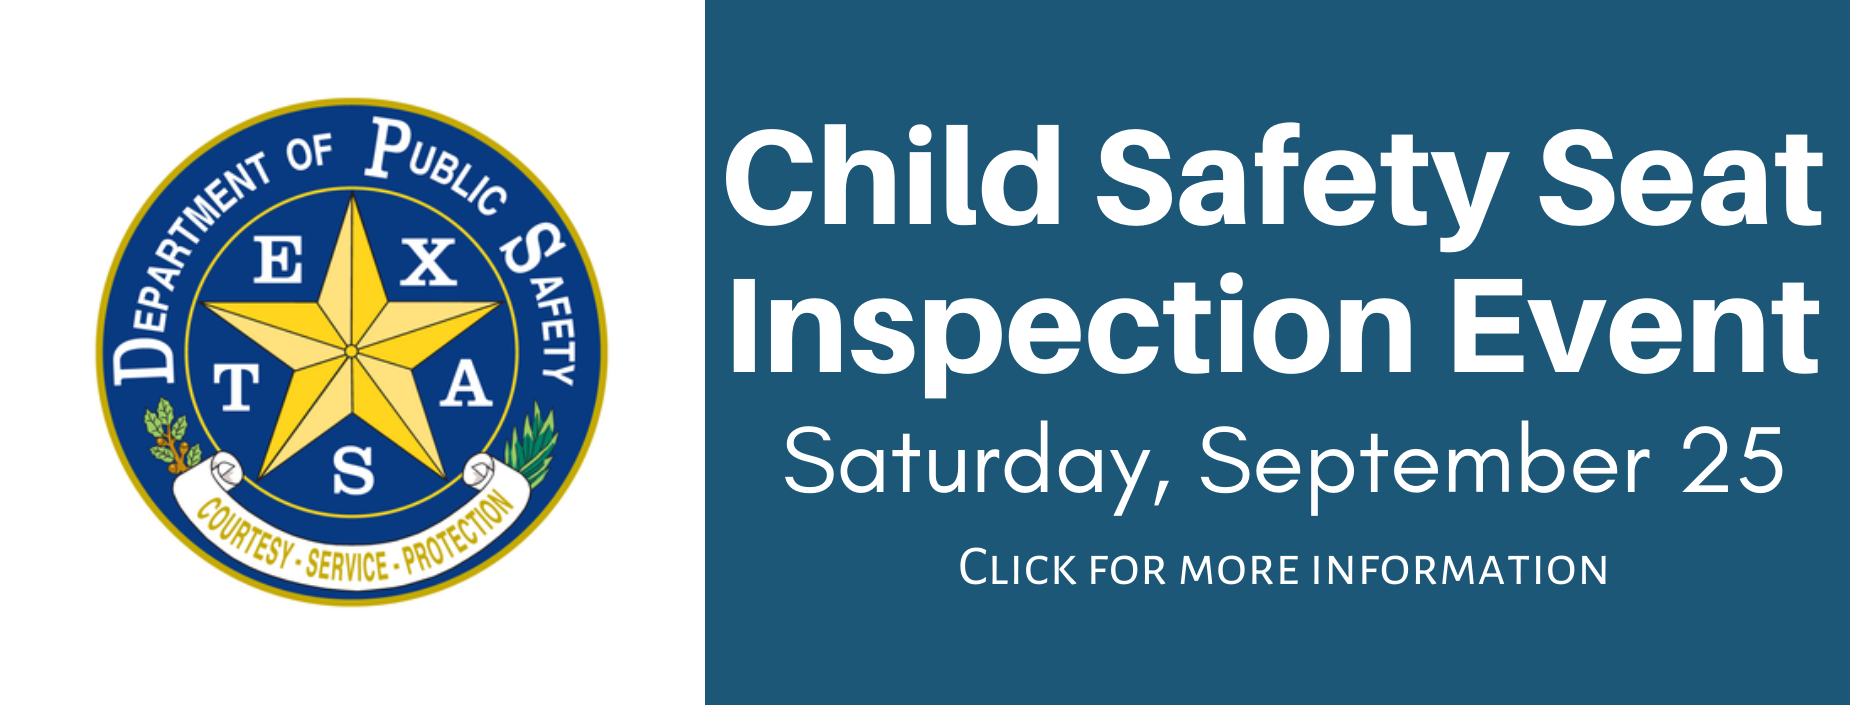 TXDPS Child Safety Seat Event